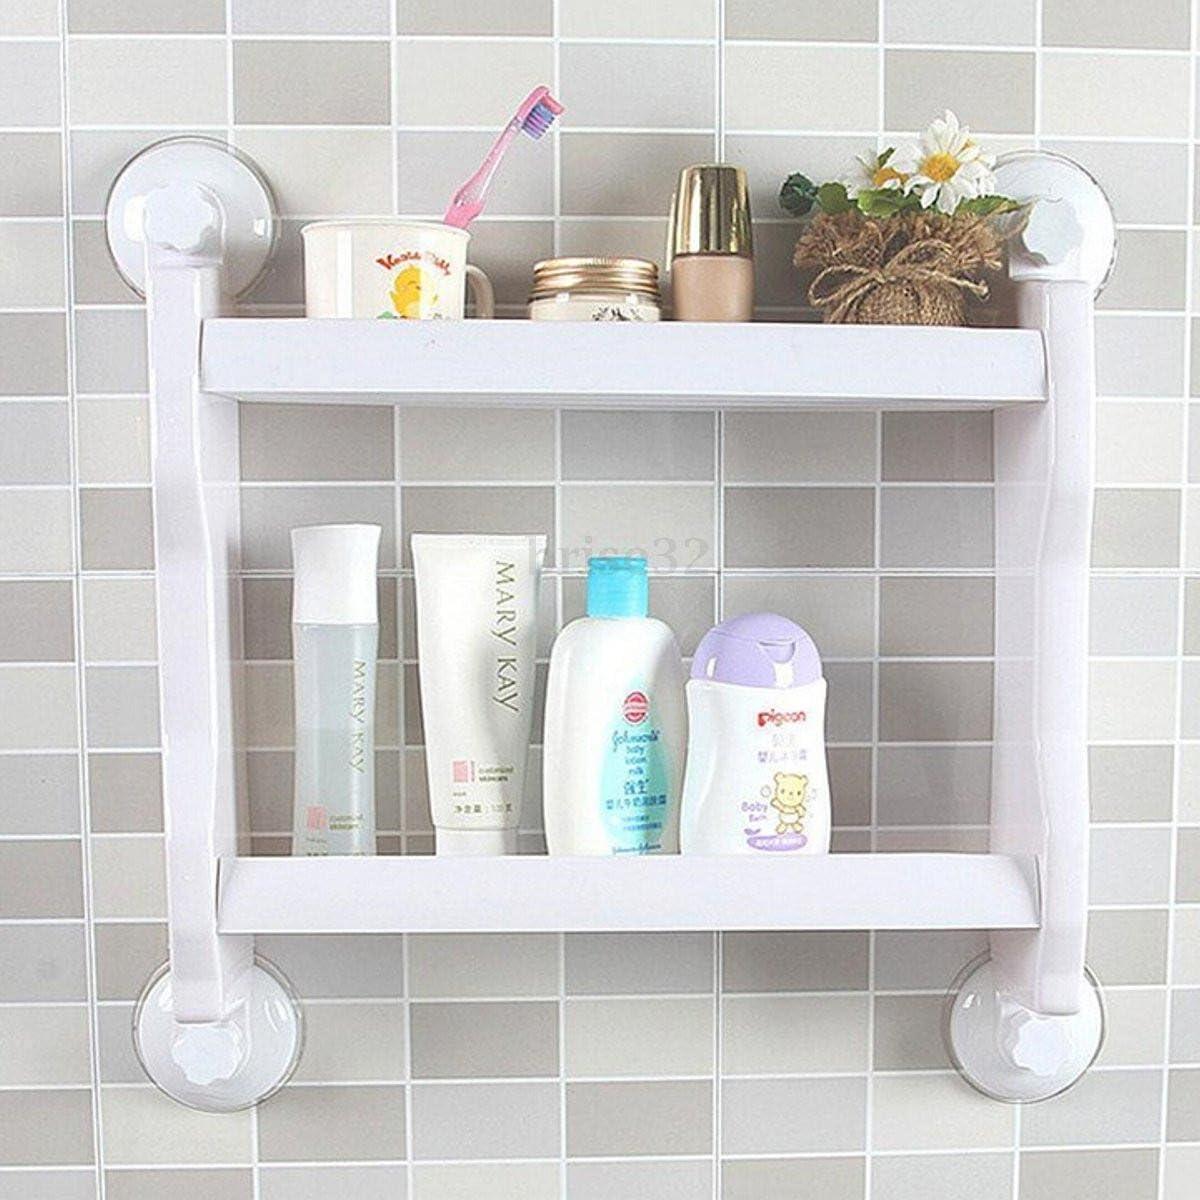 NEW Plastic Bathroom Shelf With Suction Rack Organizer Shower Storage Cup